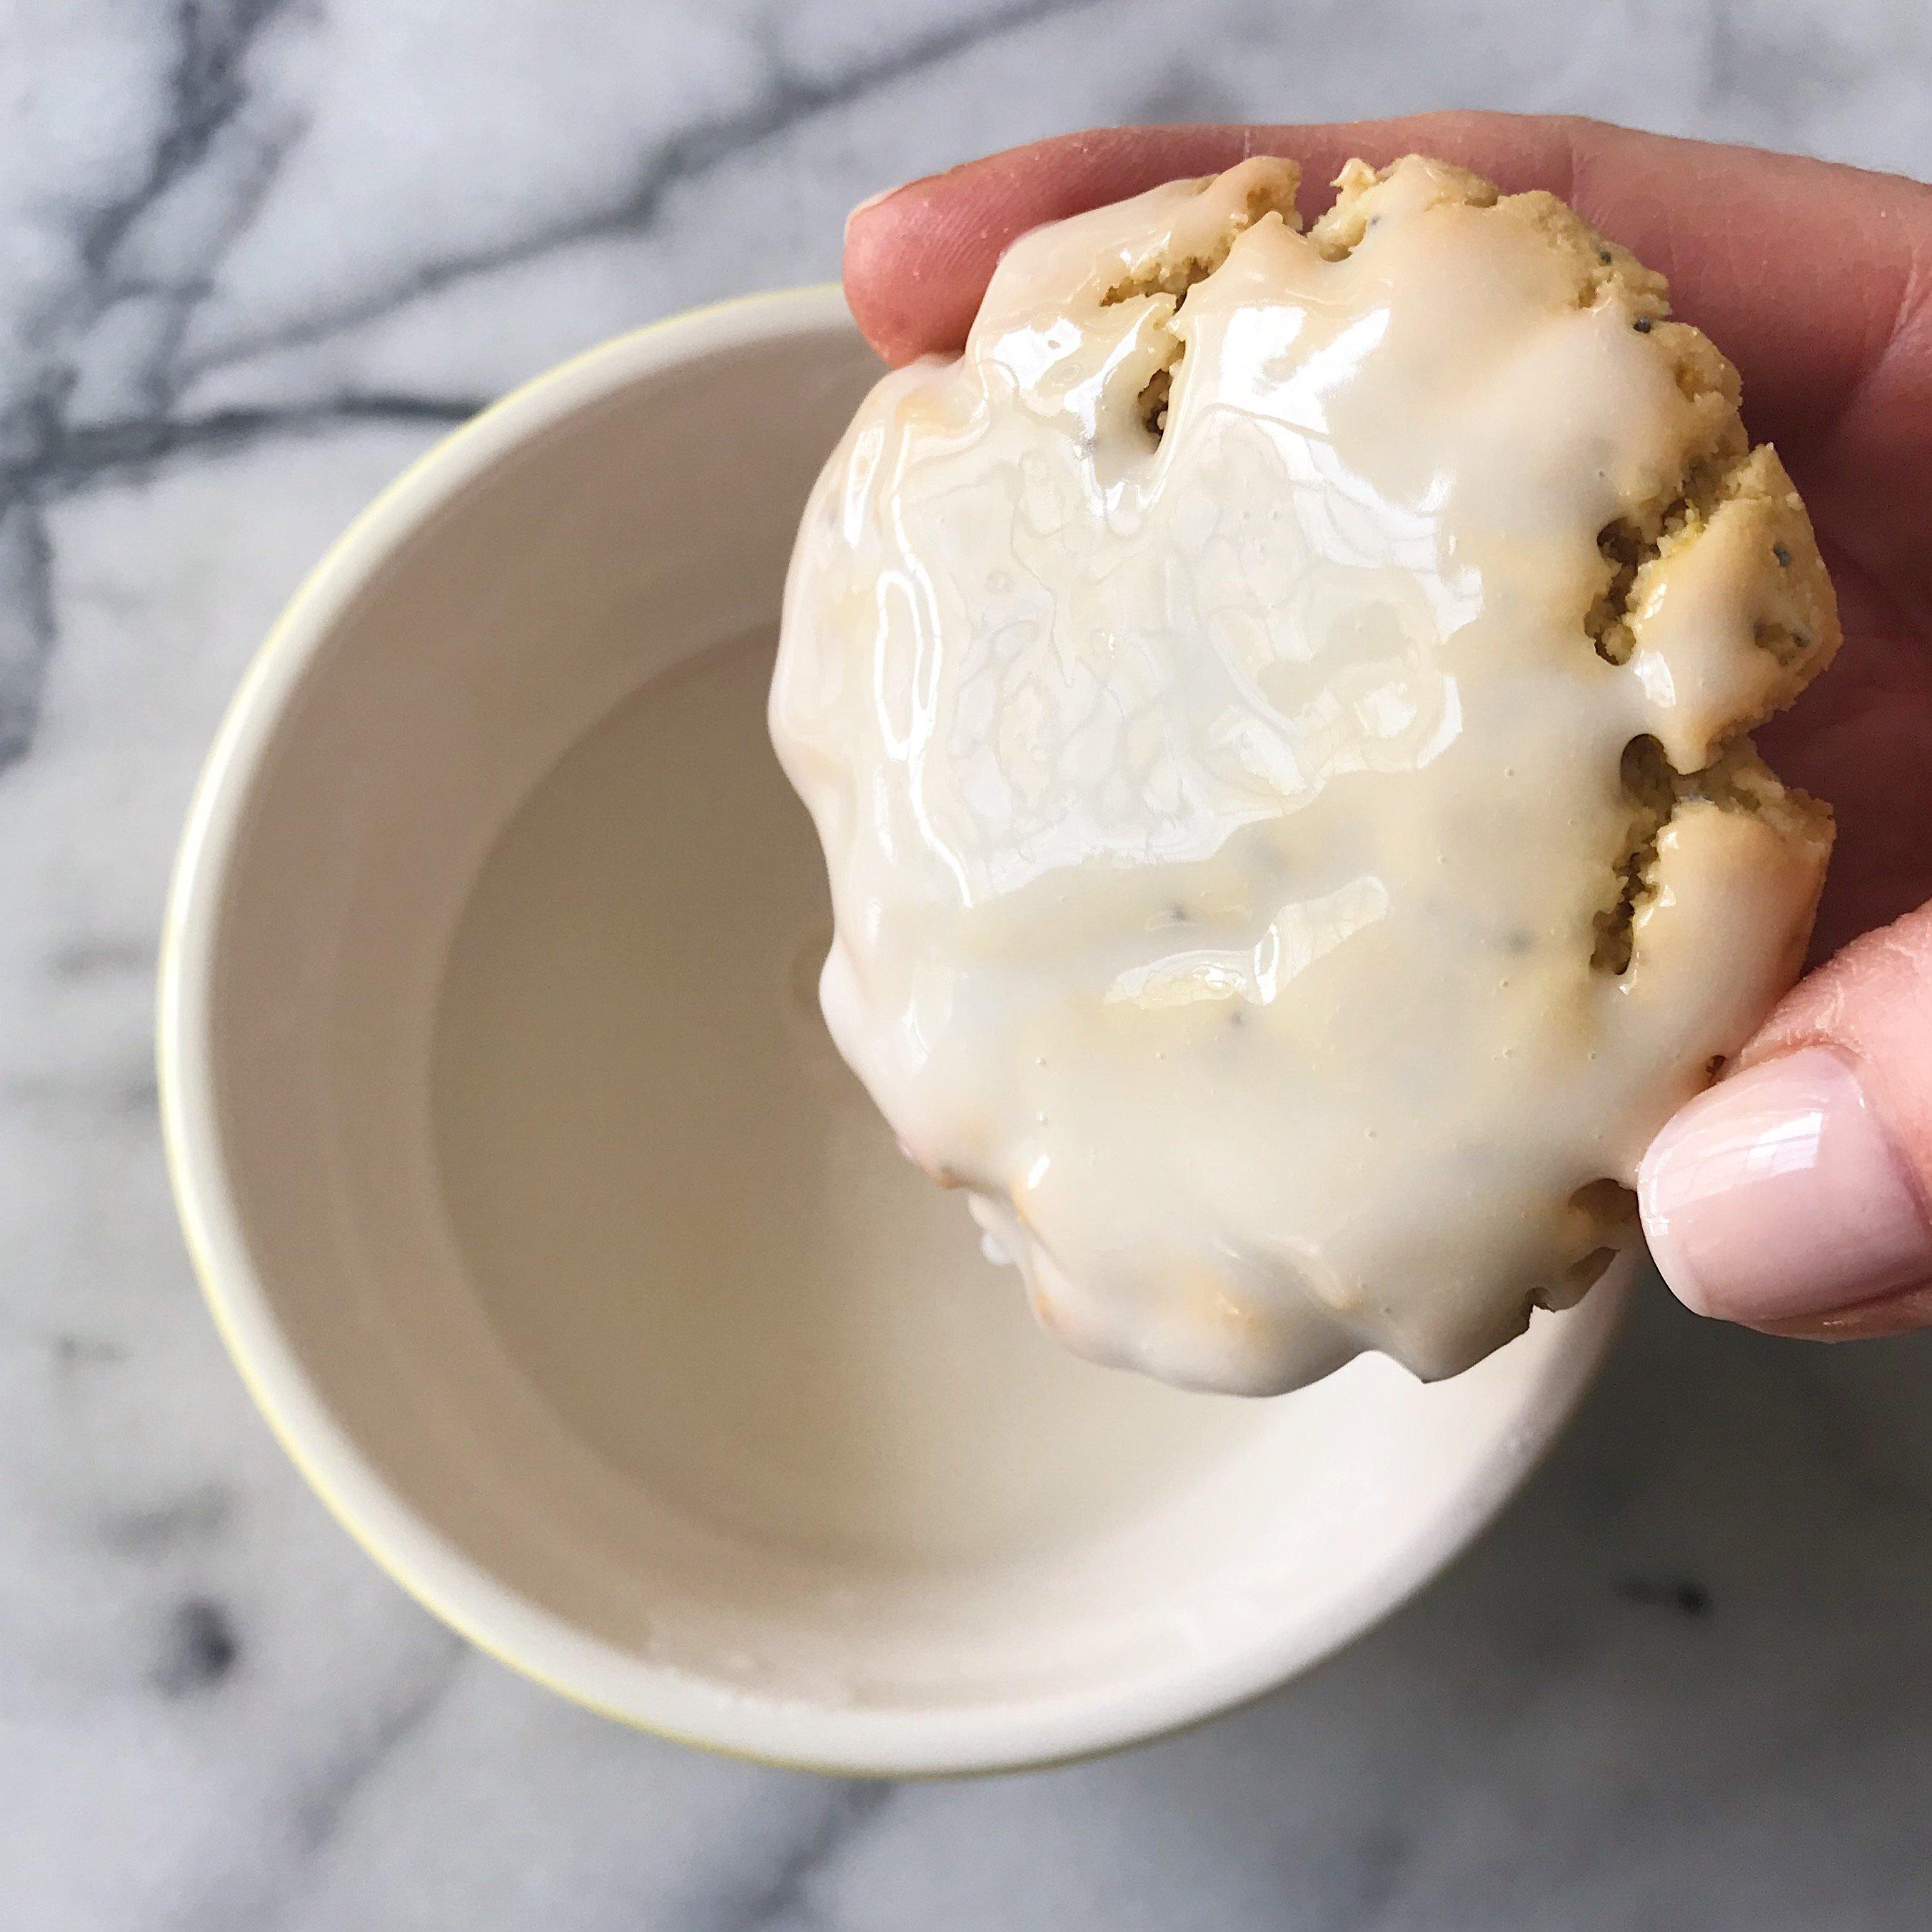 soft baked lemon poppyseed cookies #glutenfree #vegan #paleofriendly #healthygffamily healthygffamily.com